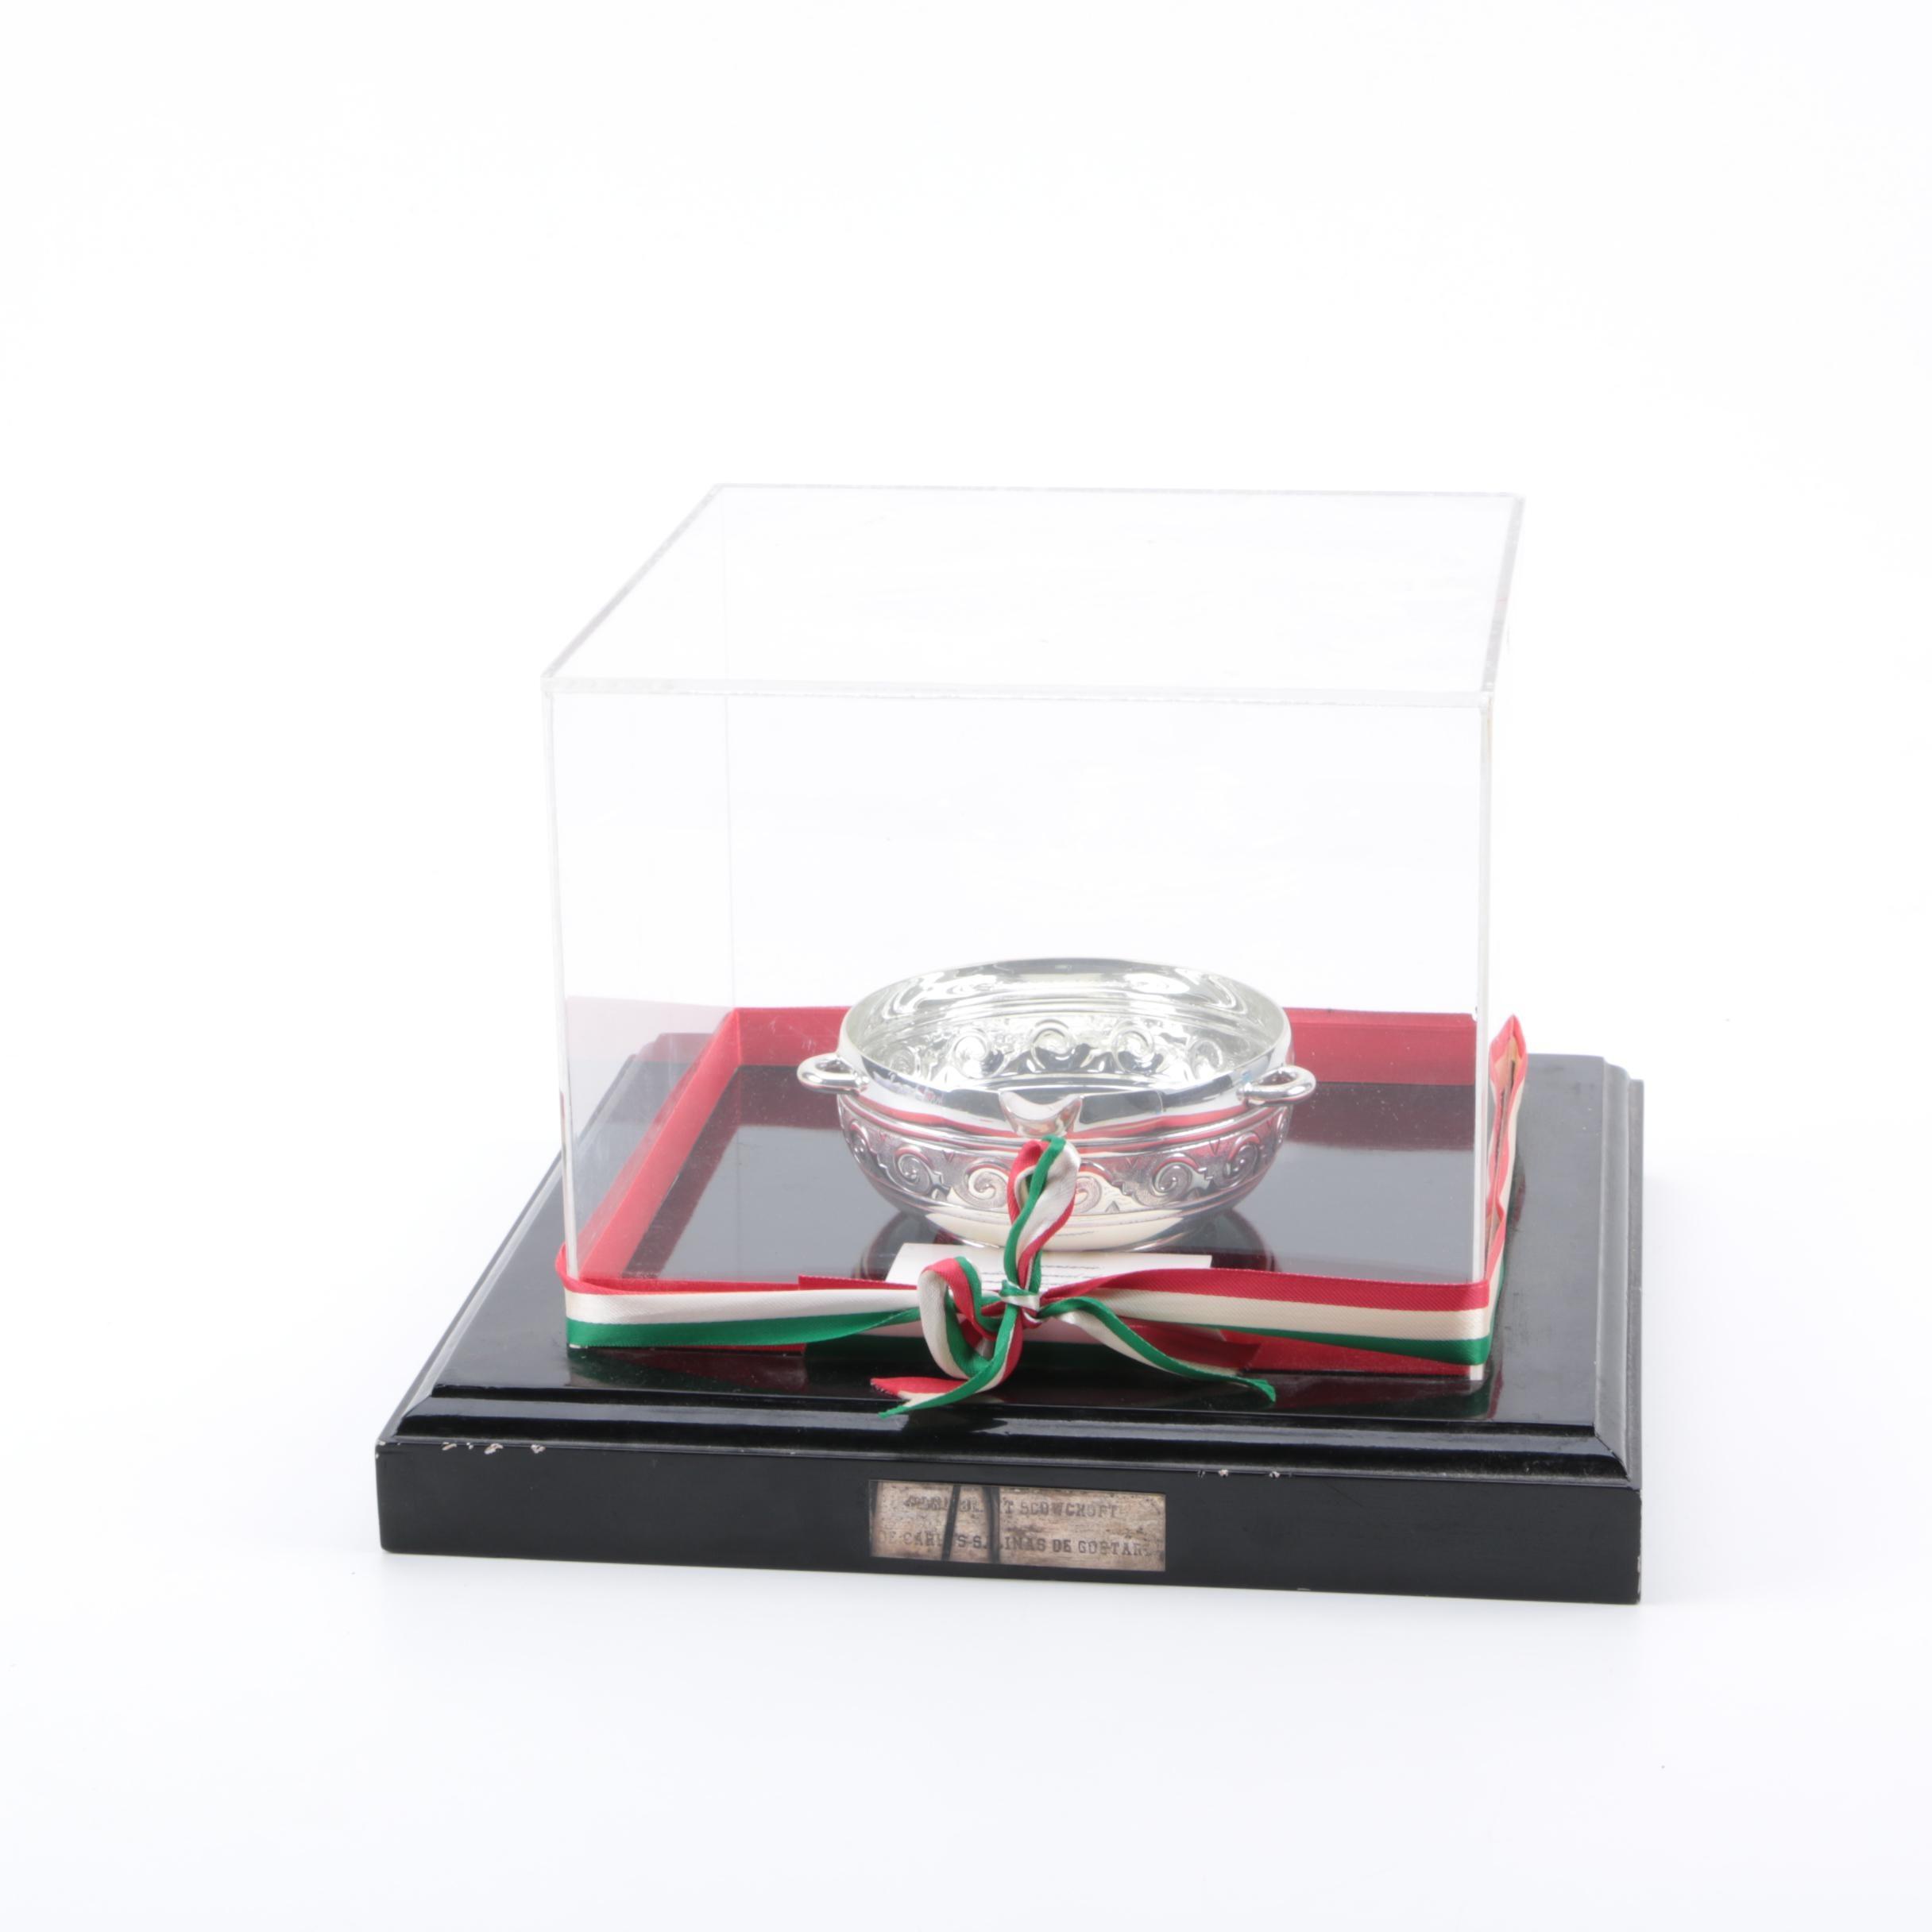 Vintage Sterling Silver Censer Gifted to Brent Snowcroft